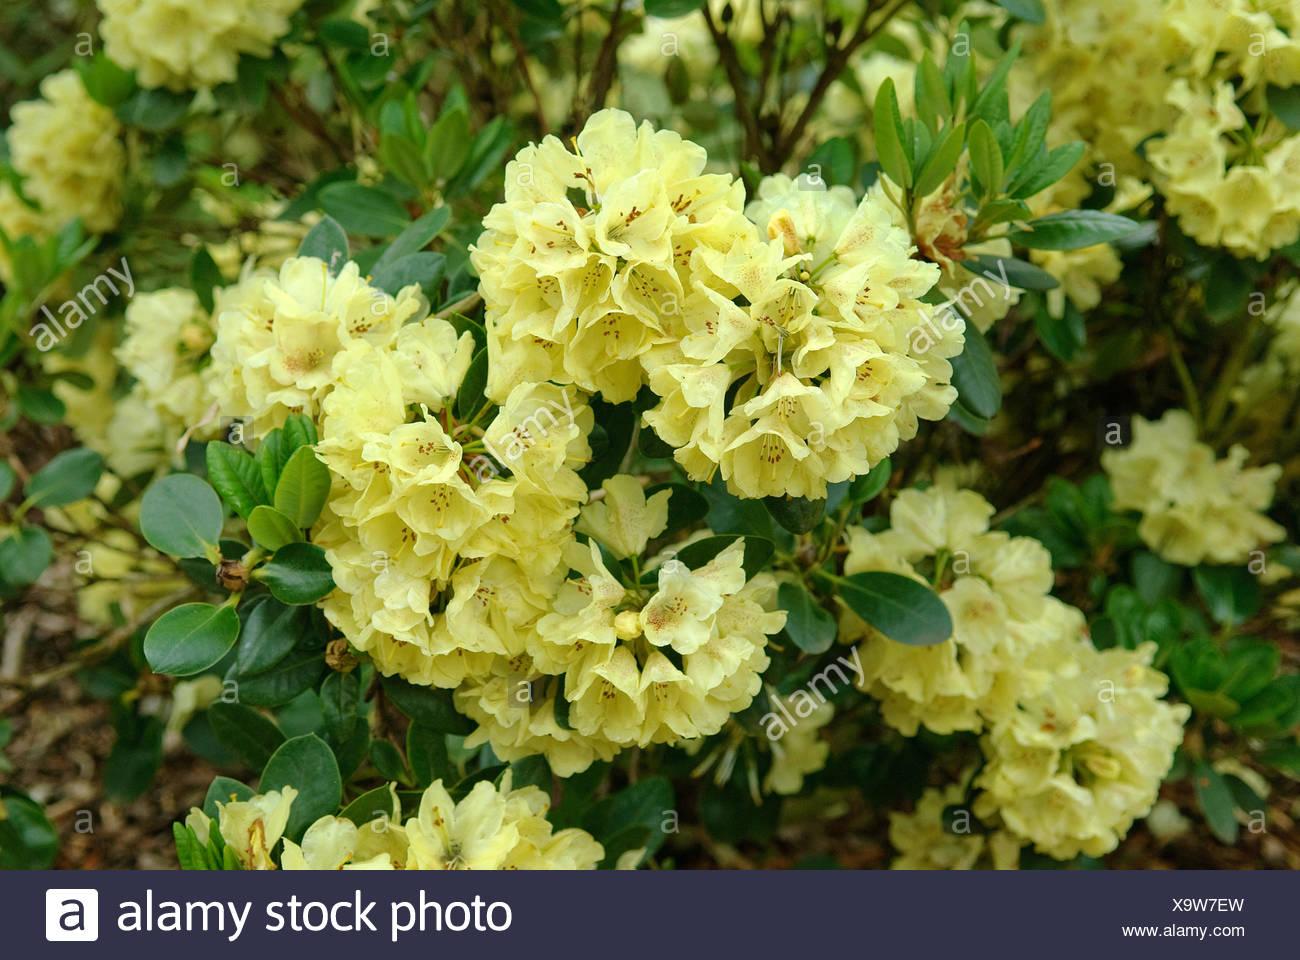 rhododendron (Rhododendron 'Goldkrone', Rhododendron Goldkrone), cultivar Goldkrone - Stock Image